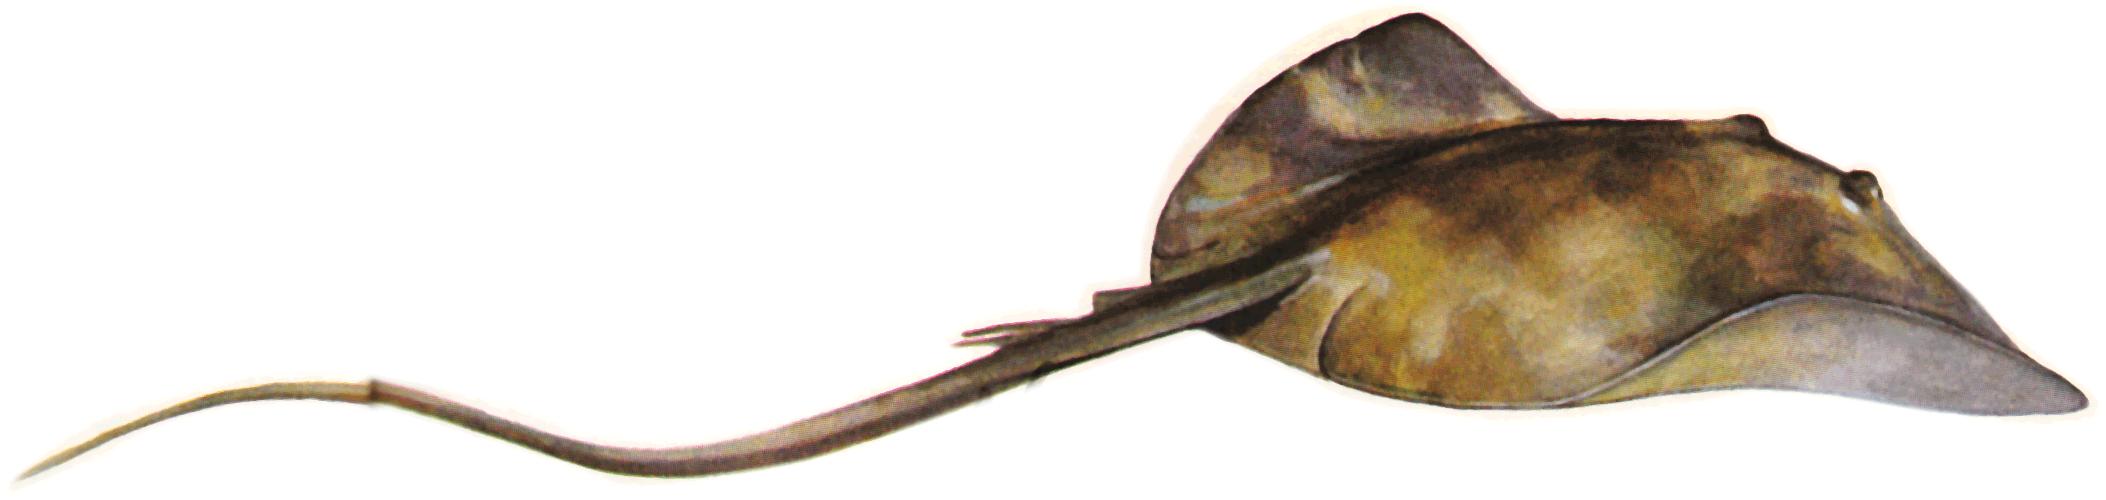 Stingray PNG - 75545